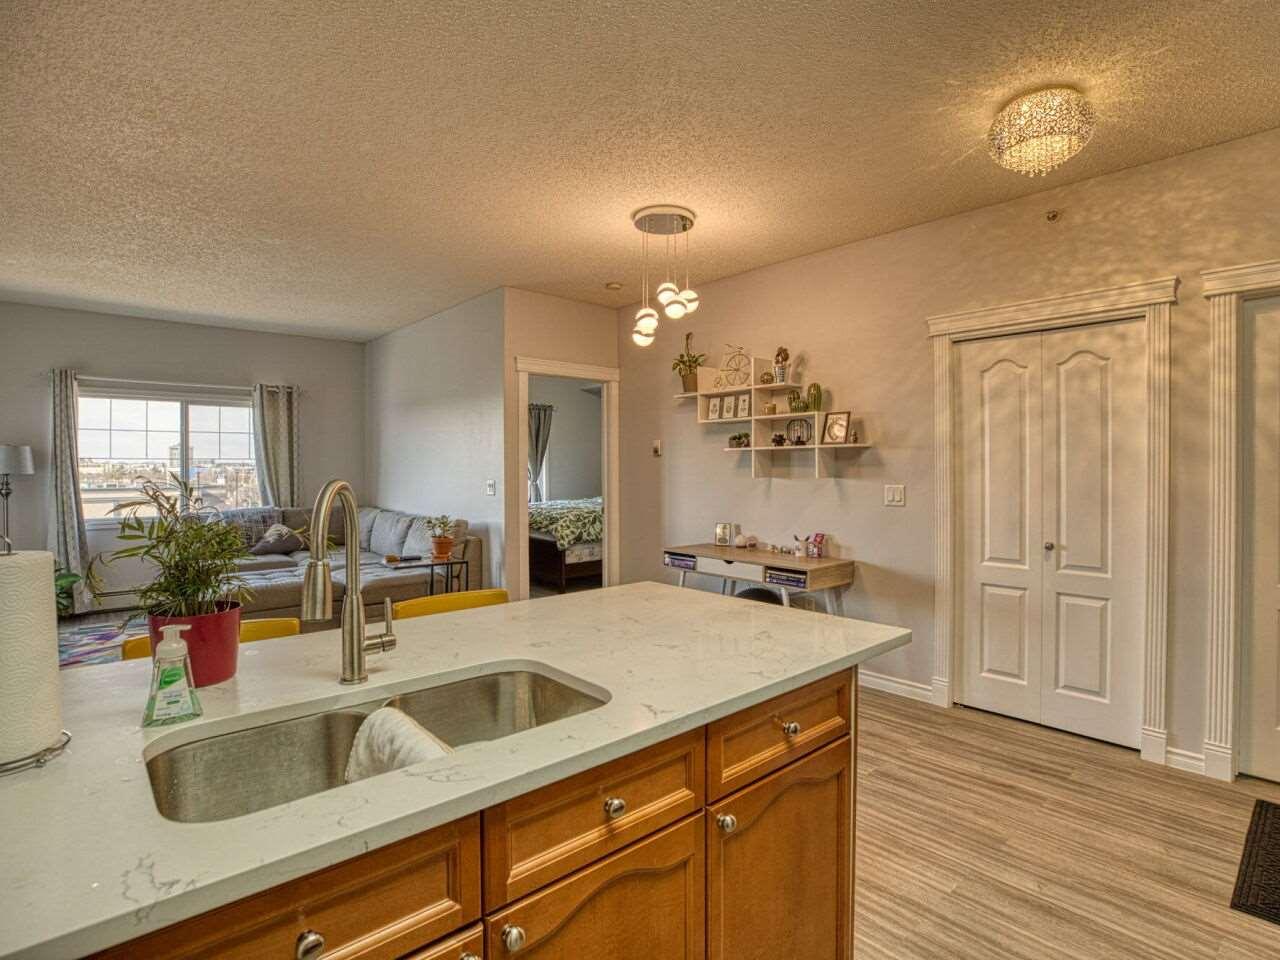 429 16807 100 Avenue - Glenwood_EDMO Lowrise Apartment for sale, 2 Bedrooms (E4234341) #11